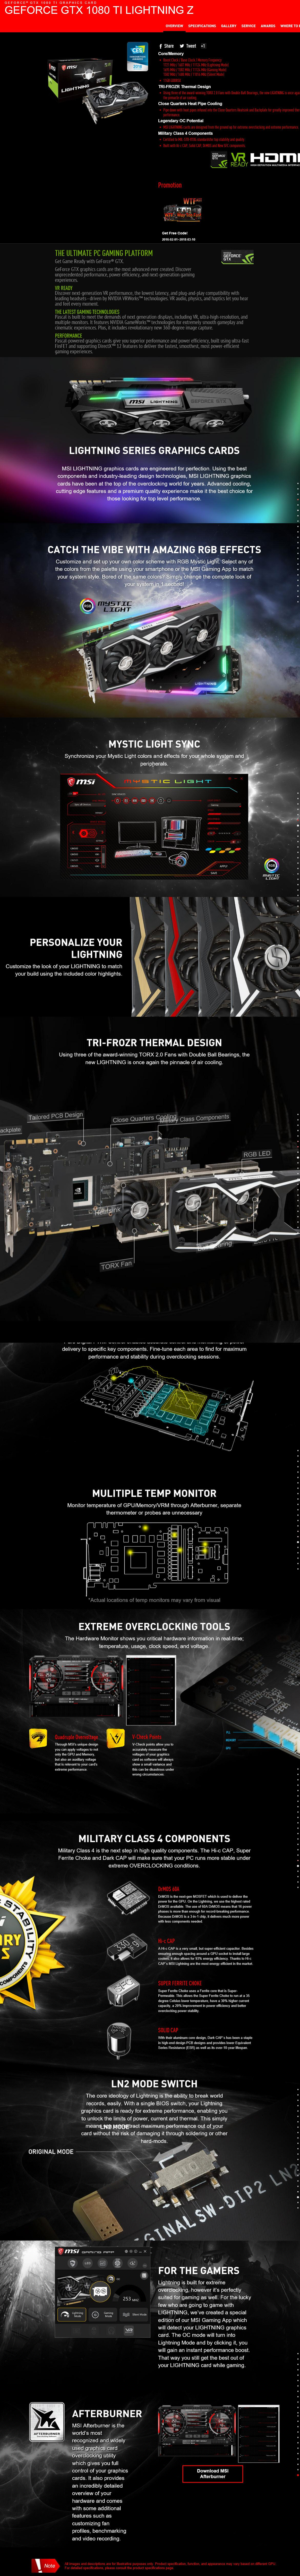 2017 12 12 23 03 33 MSI GeForce GTX 1080 Ti Lightning Z Review